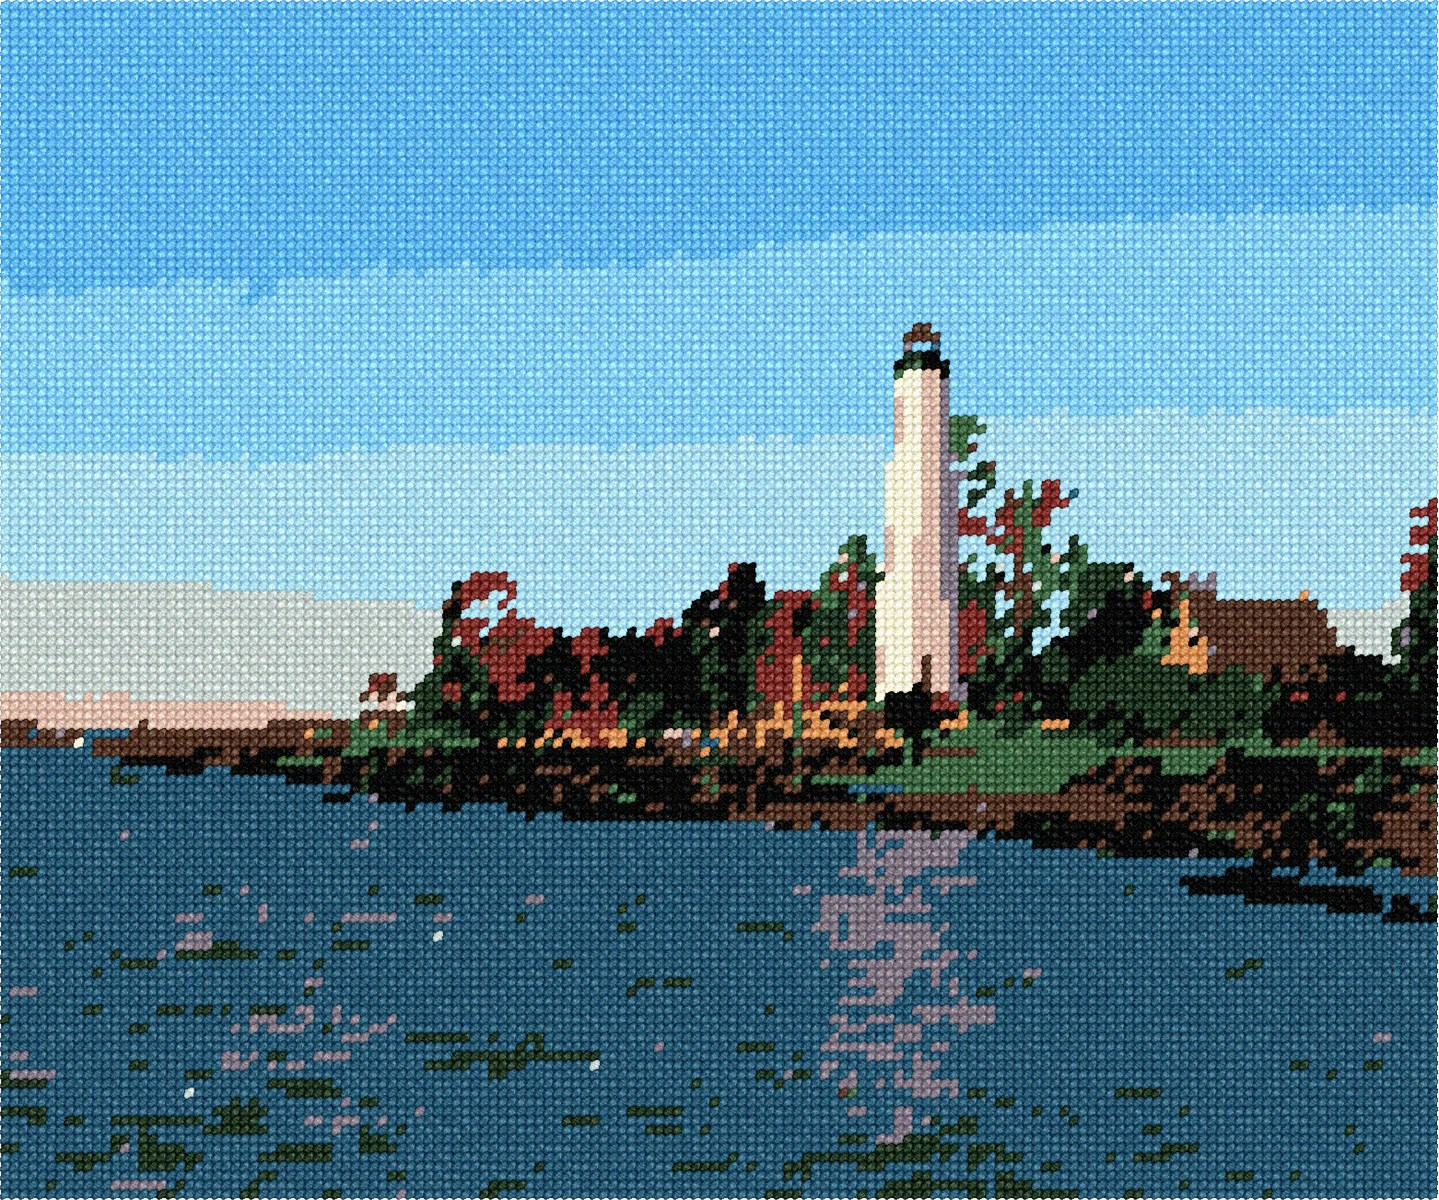 Lighthouse On The Sea Needlepoint Kit or Canvas Nautical//Ocean